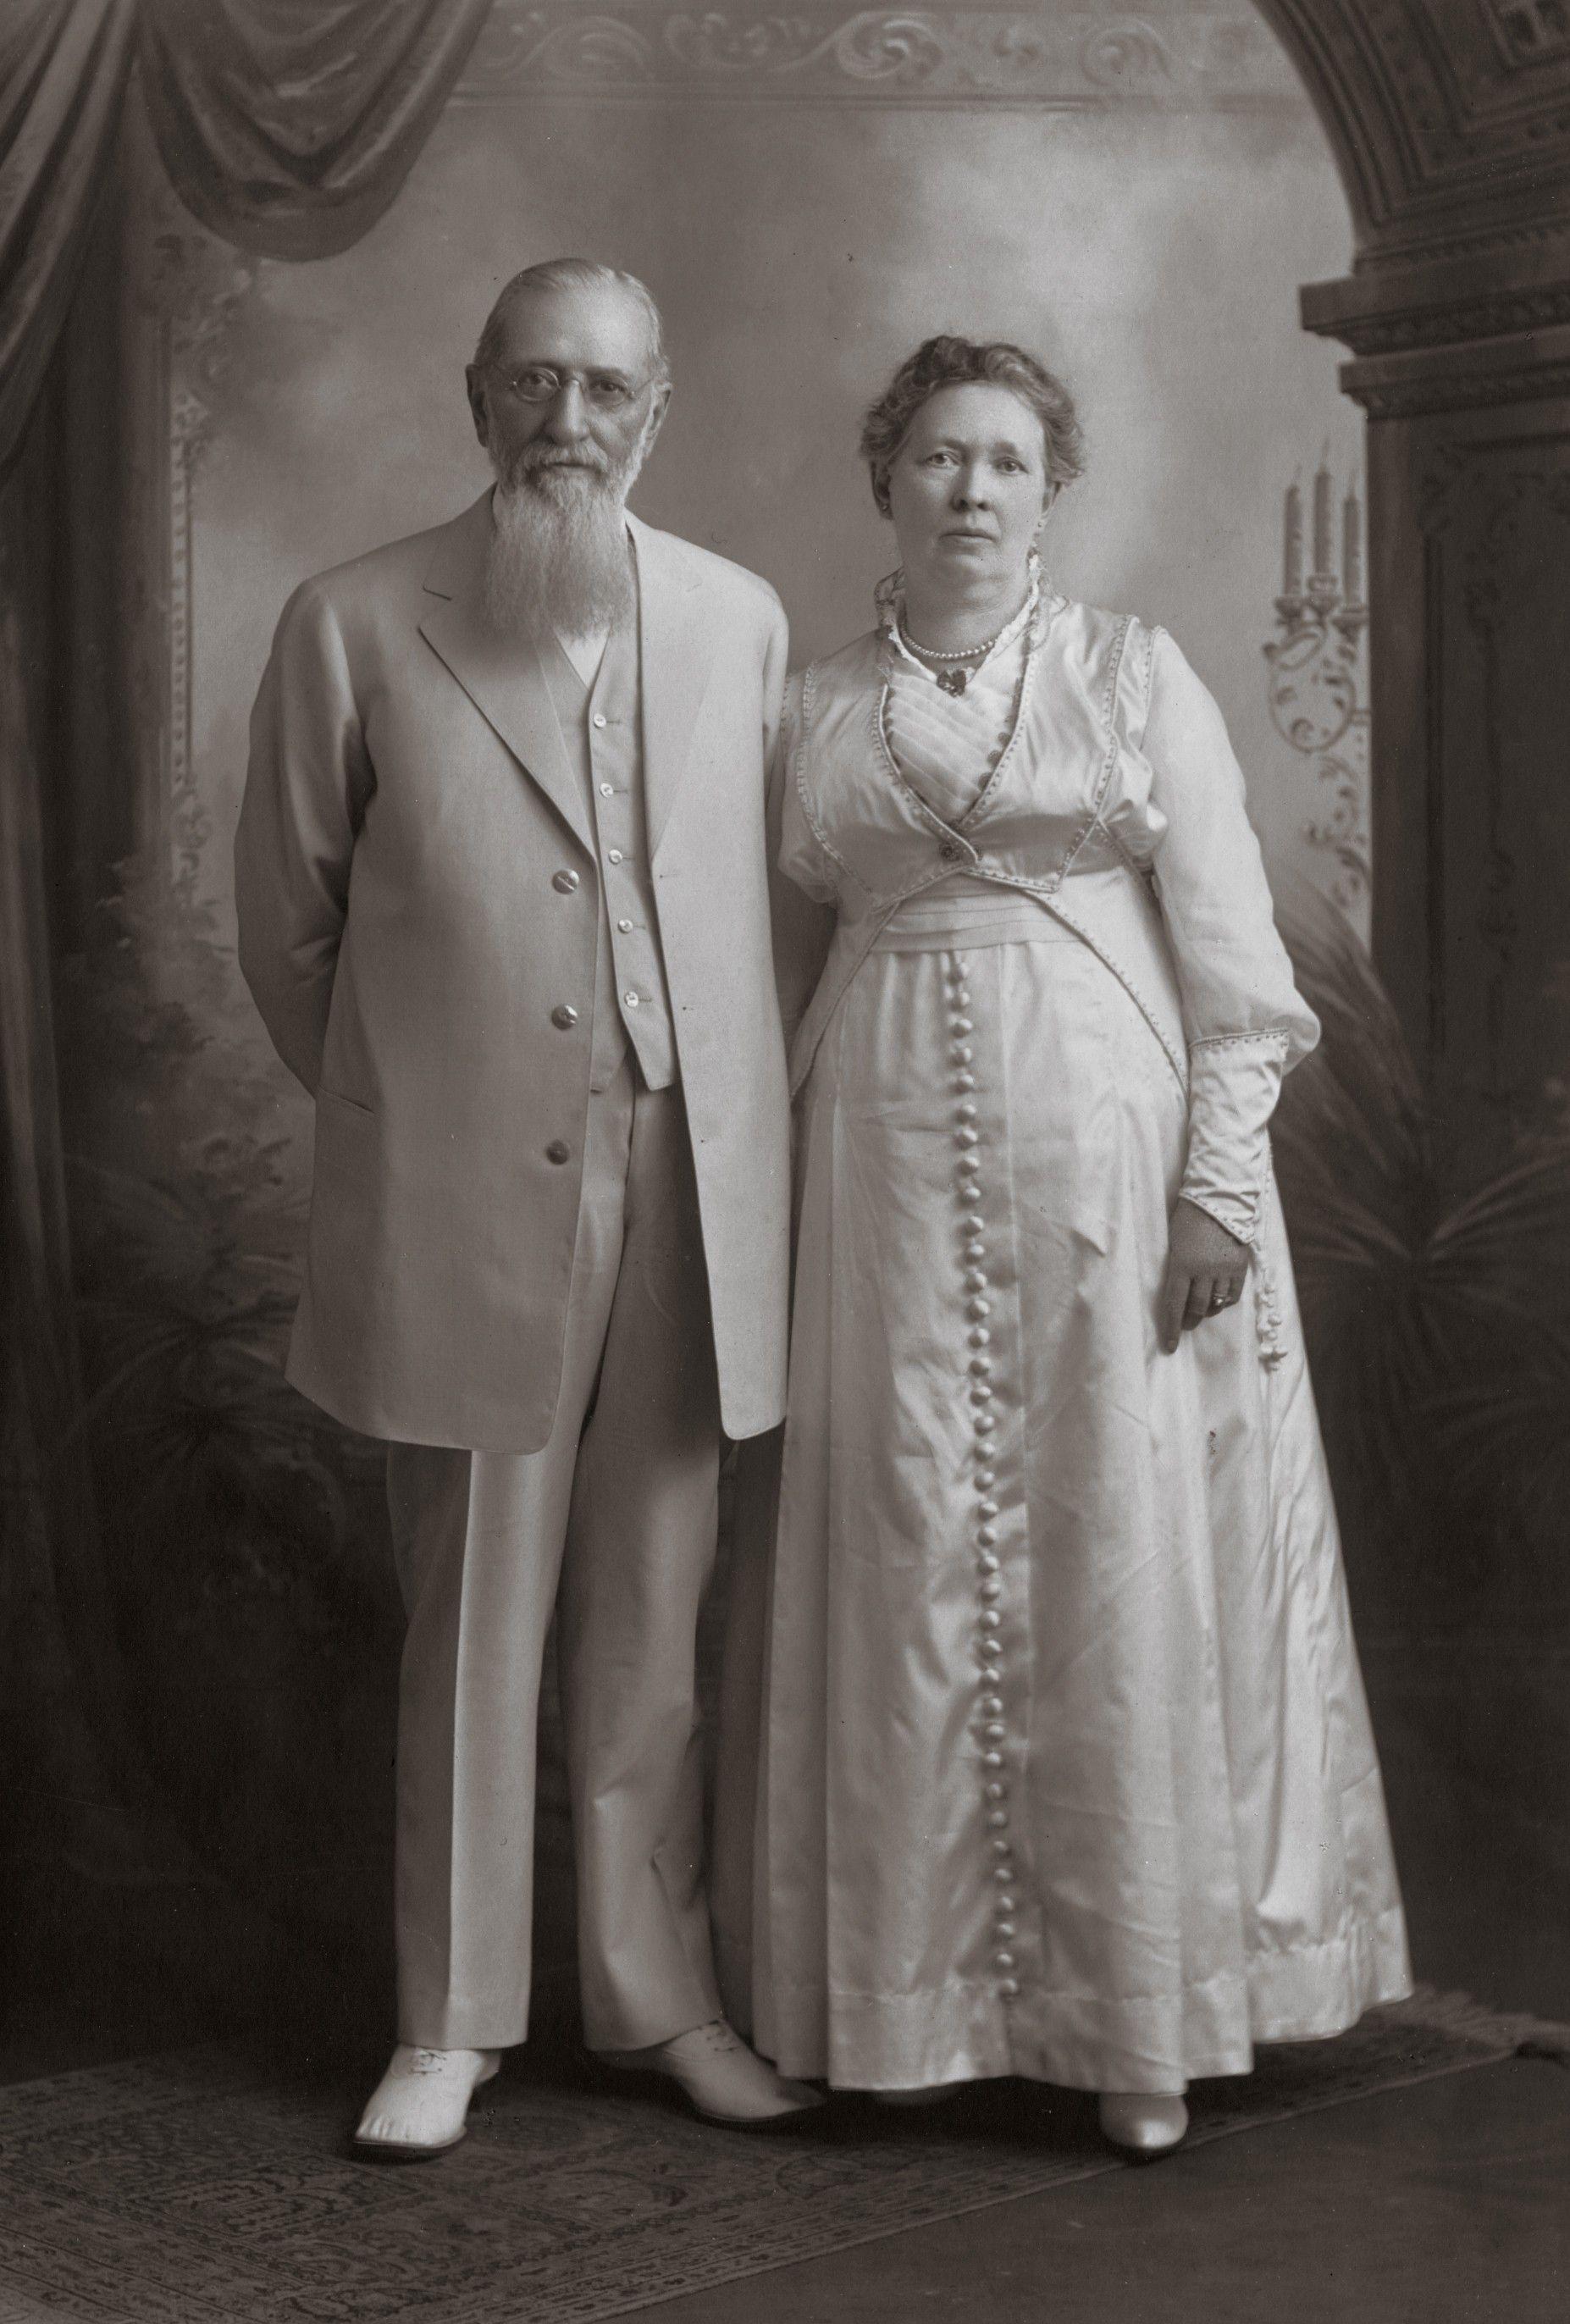 Joseph Fielding Smith's parents, Joseph F. Smith and Julina Lambson Smith. Teachings of Presidents of the Church: Joseph Fielding Smith (2013), 2